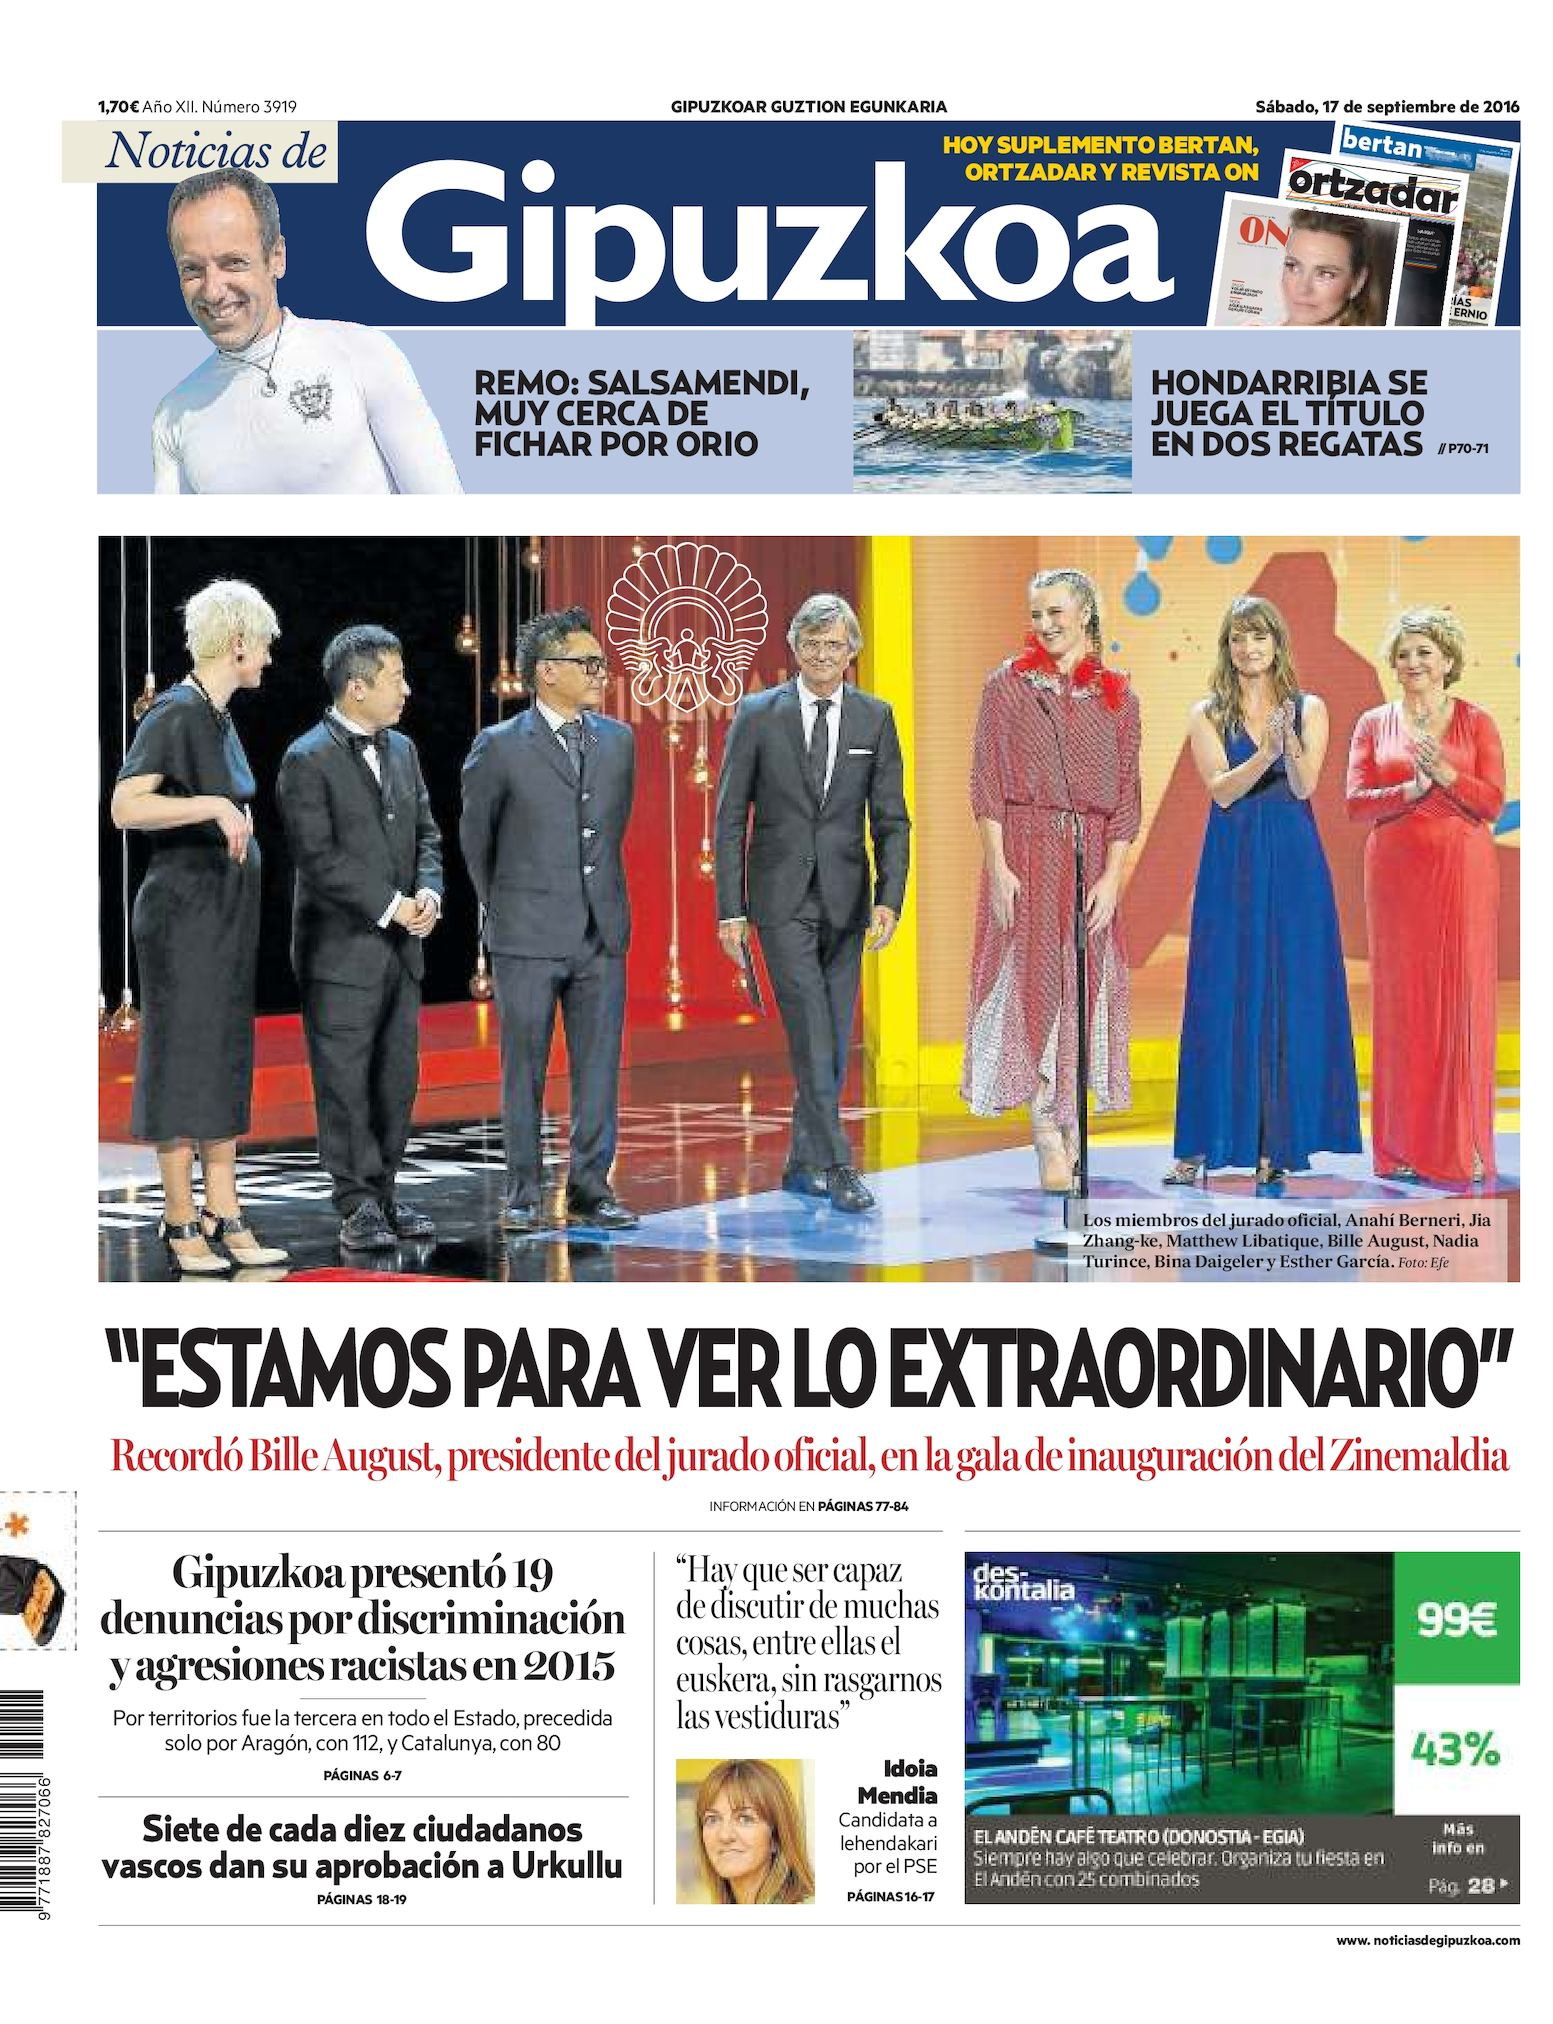 dd9e68af9a Calaméo - Noticias de Gipuzkoa 20160917